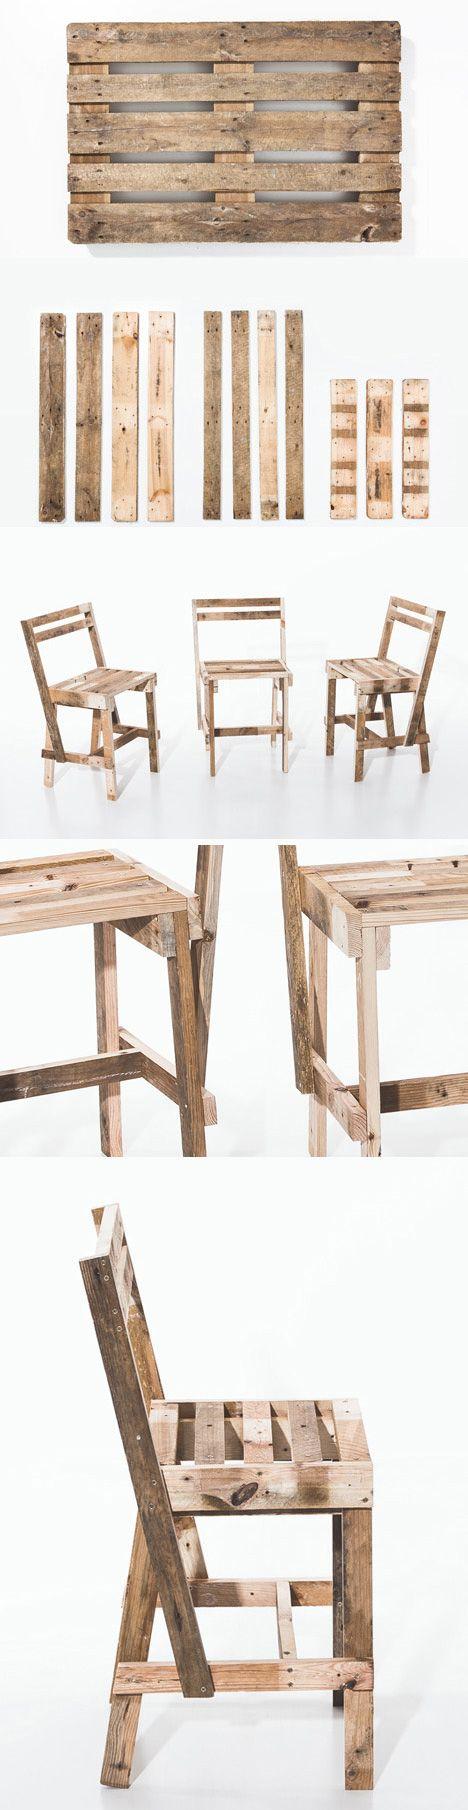 stuhl aus paletten selbst gebaut paletten repinned by diy paletten. Black Bedroom Furniture Sets. Home Design Ideas